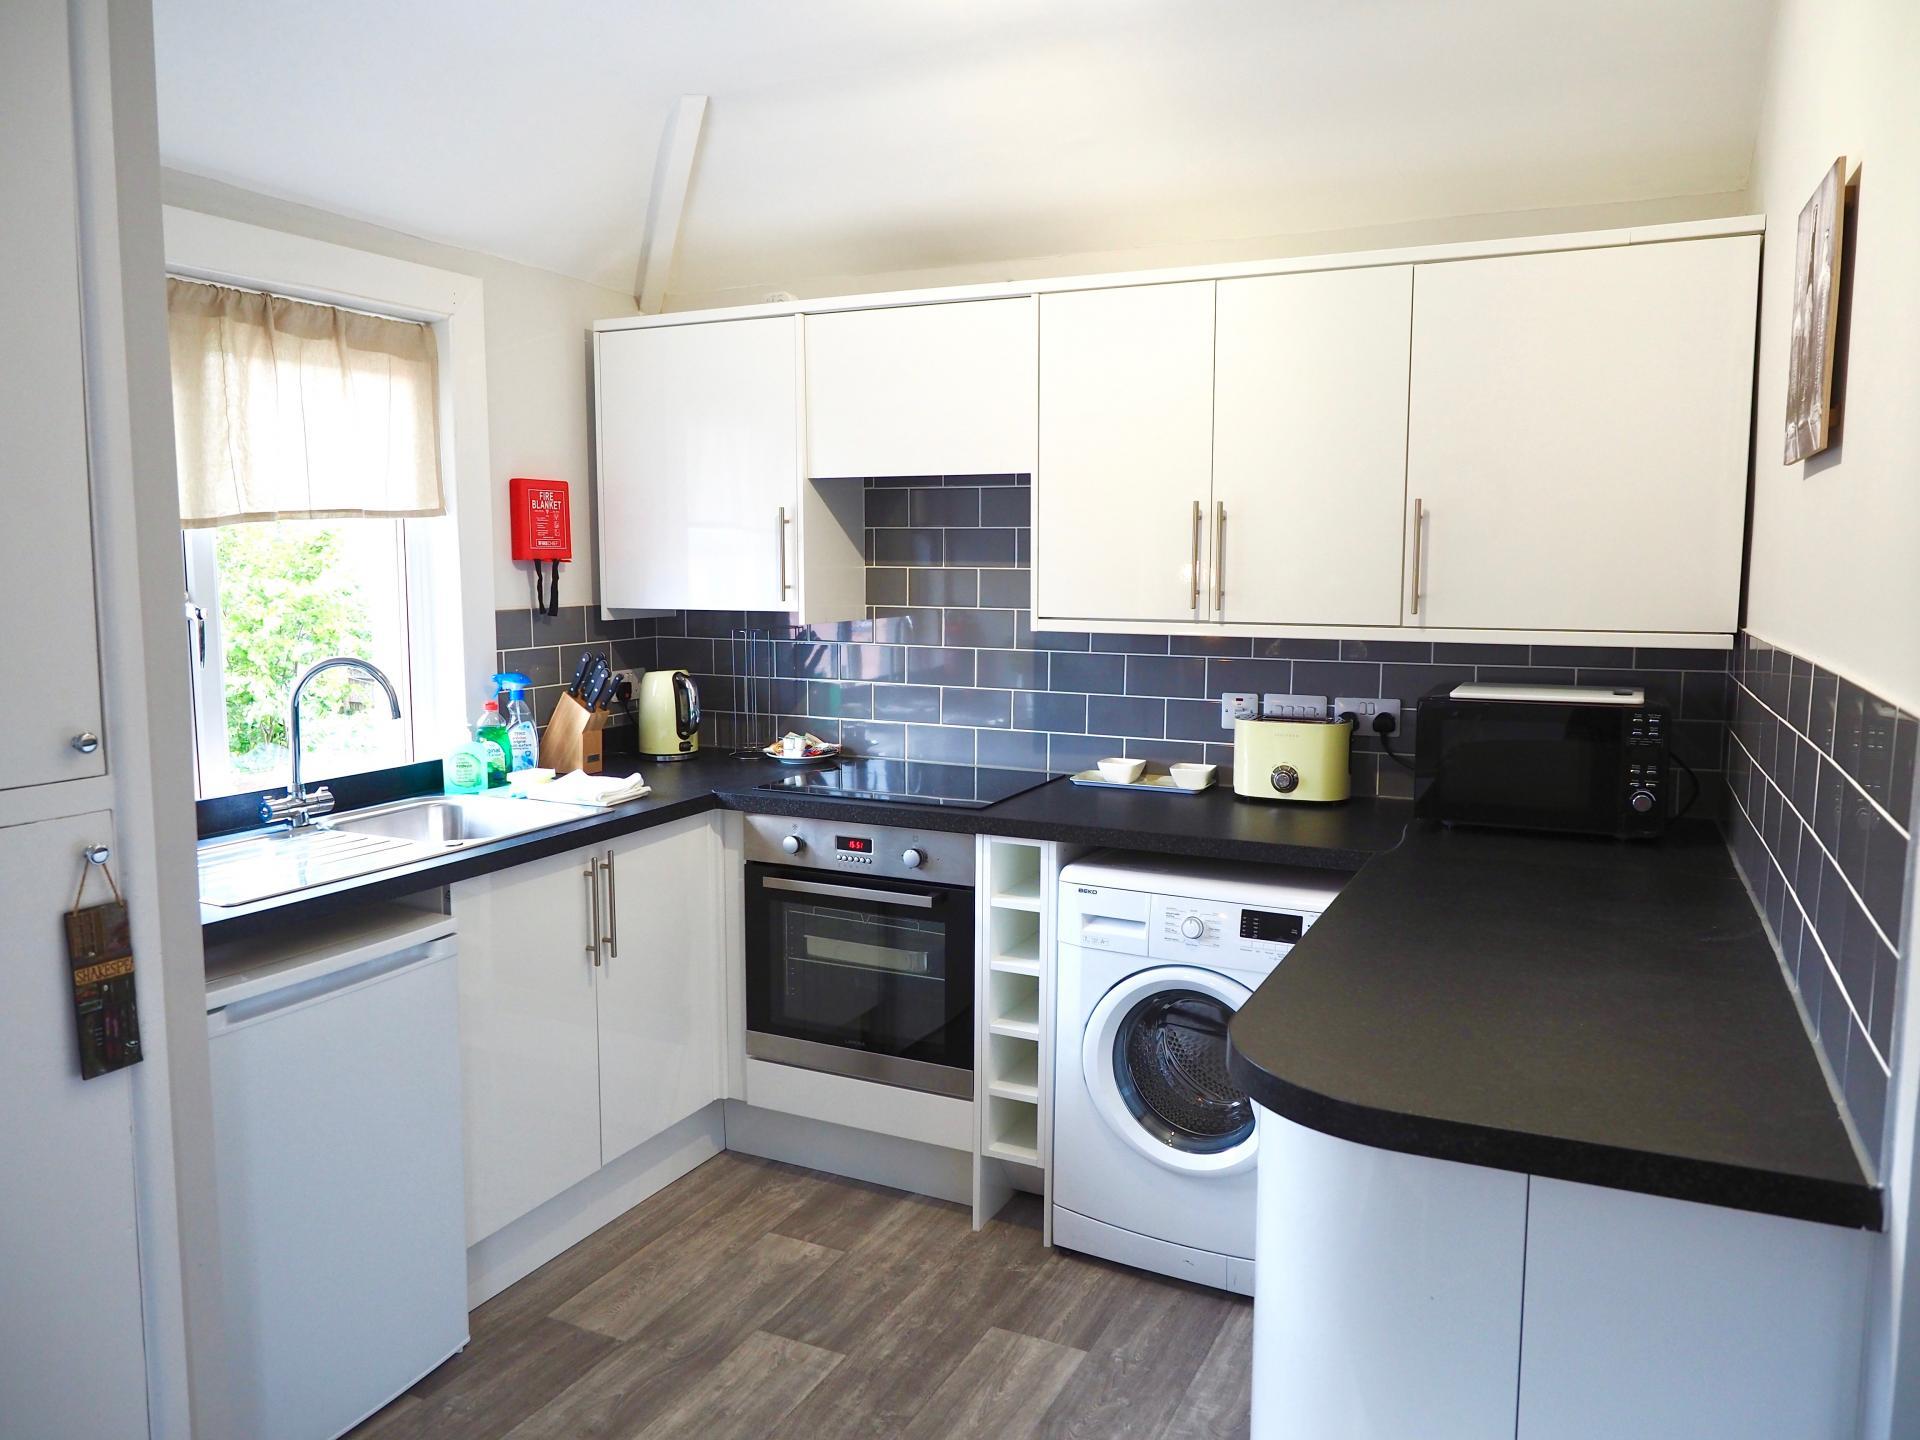 Kitchen at Exeter Suite Apartments, Headington, Oxford - Citybase Apartments